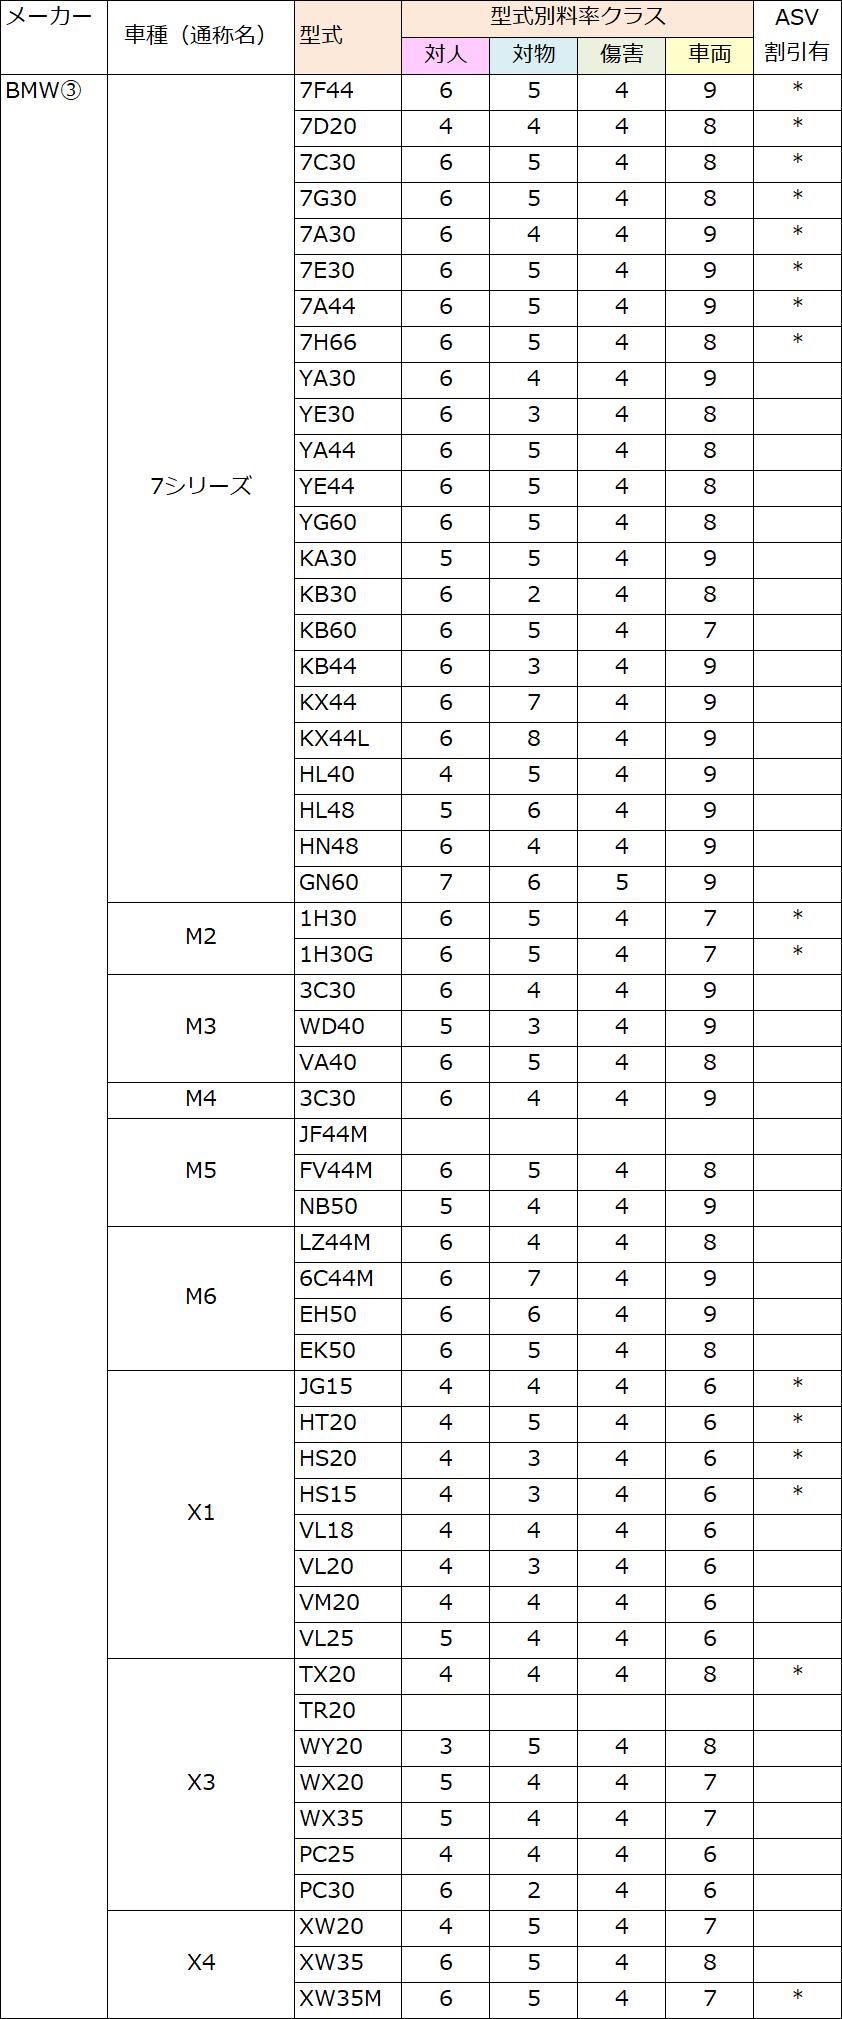 BMW(7・M2・M3・M4・M5・M6・X1・X3・X4)の料率クラス